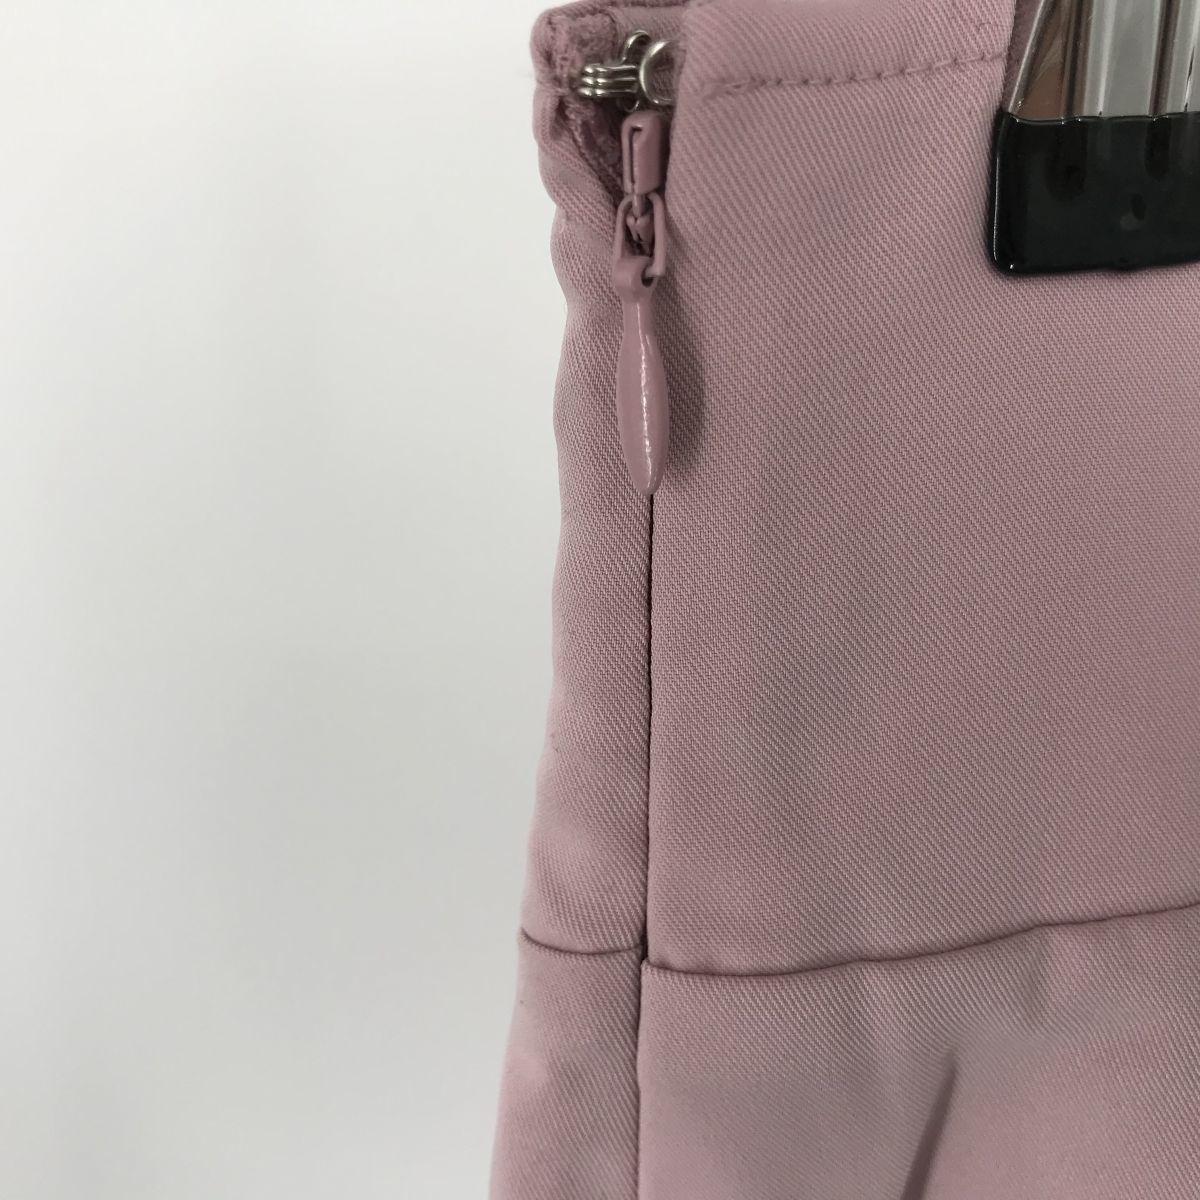 N518 rienda リエンダ キュロットスカート ベビーピンク Sサイズ  _画像3